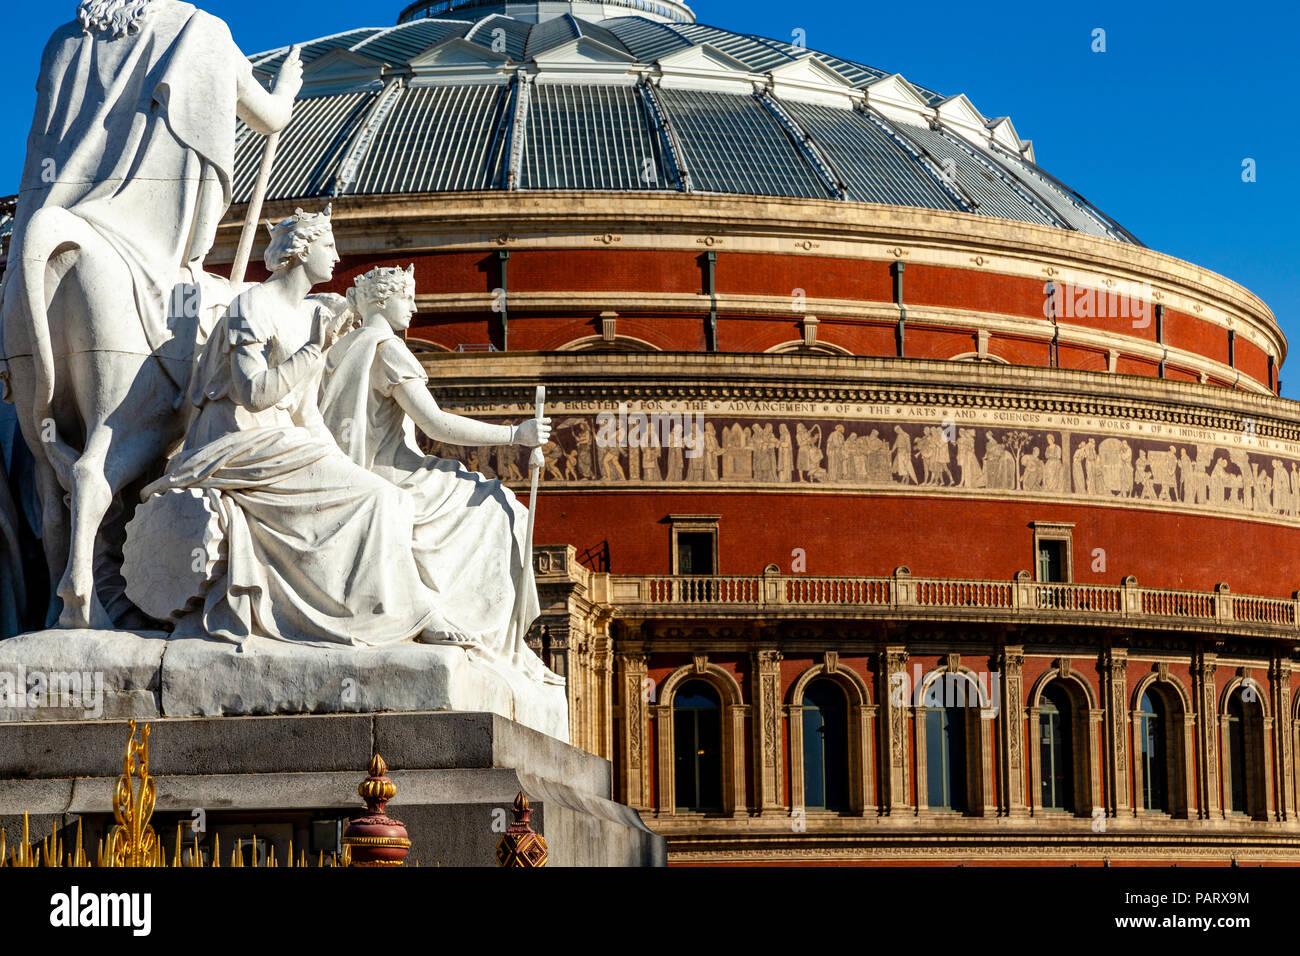 Das Albert Memorial Statue und die Royal Albert Hall, Kensington Gardens, London, UK Stockbild